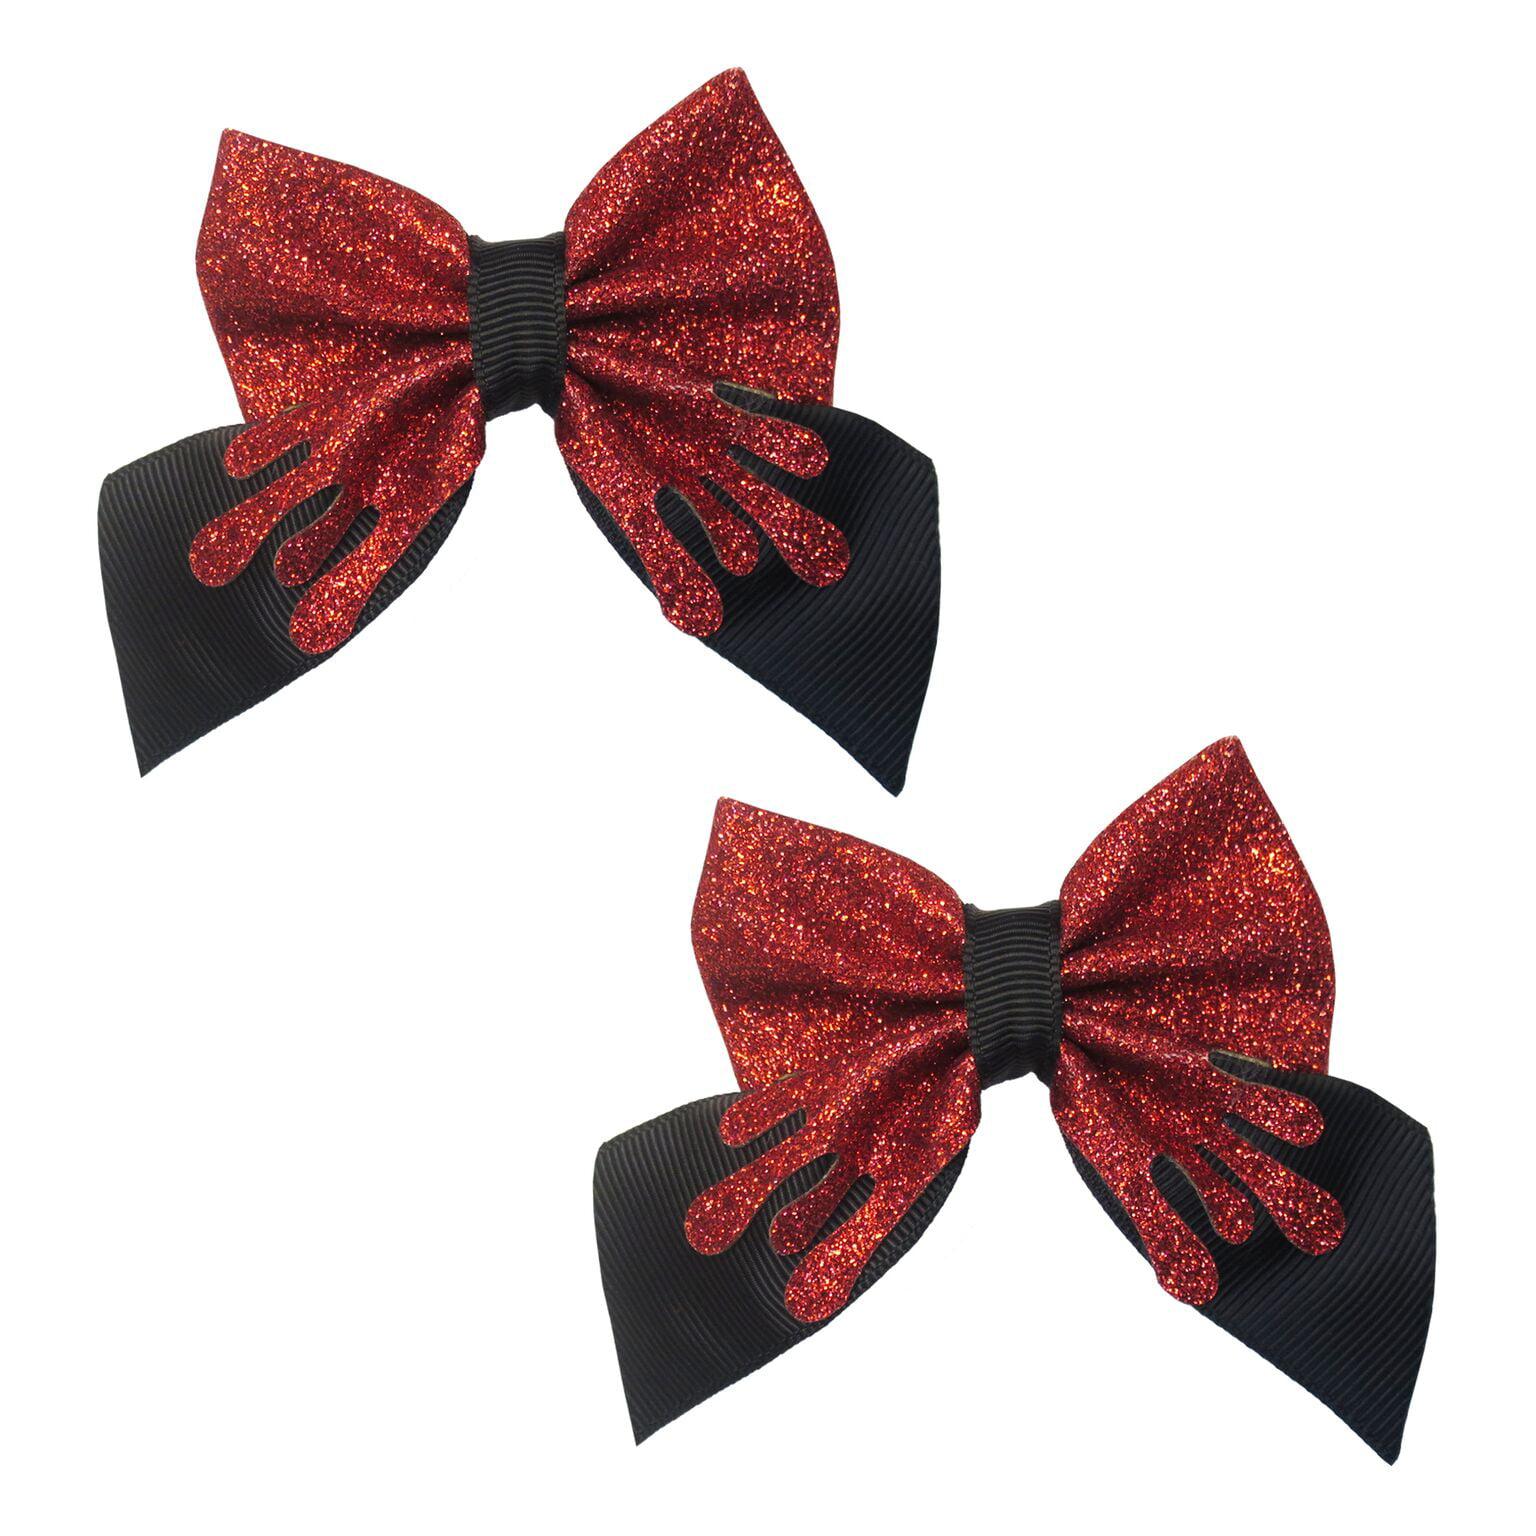 Halloween Dress up Accessories, Blood Drip Hair bows, 2-Pack